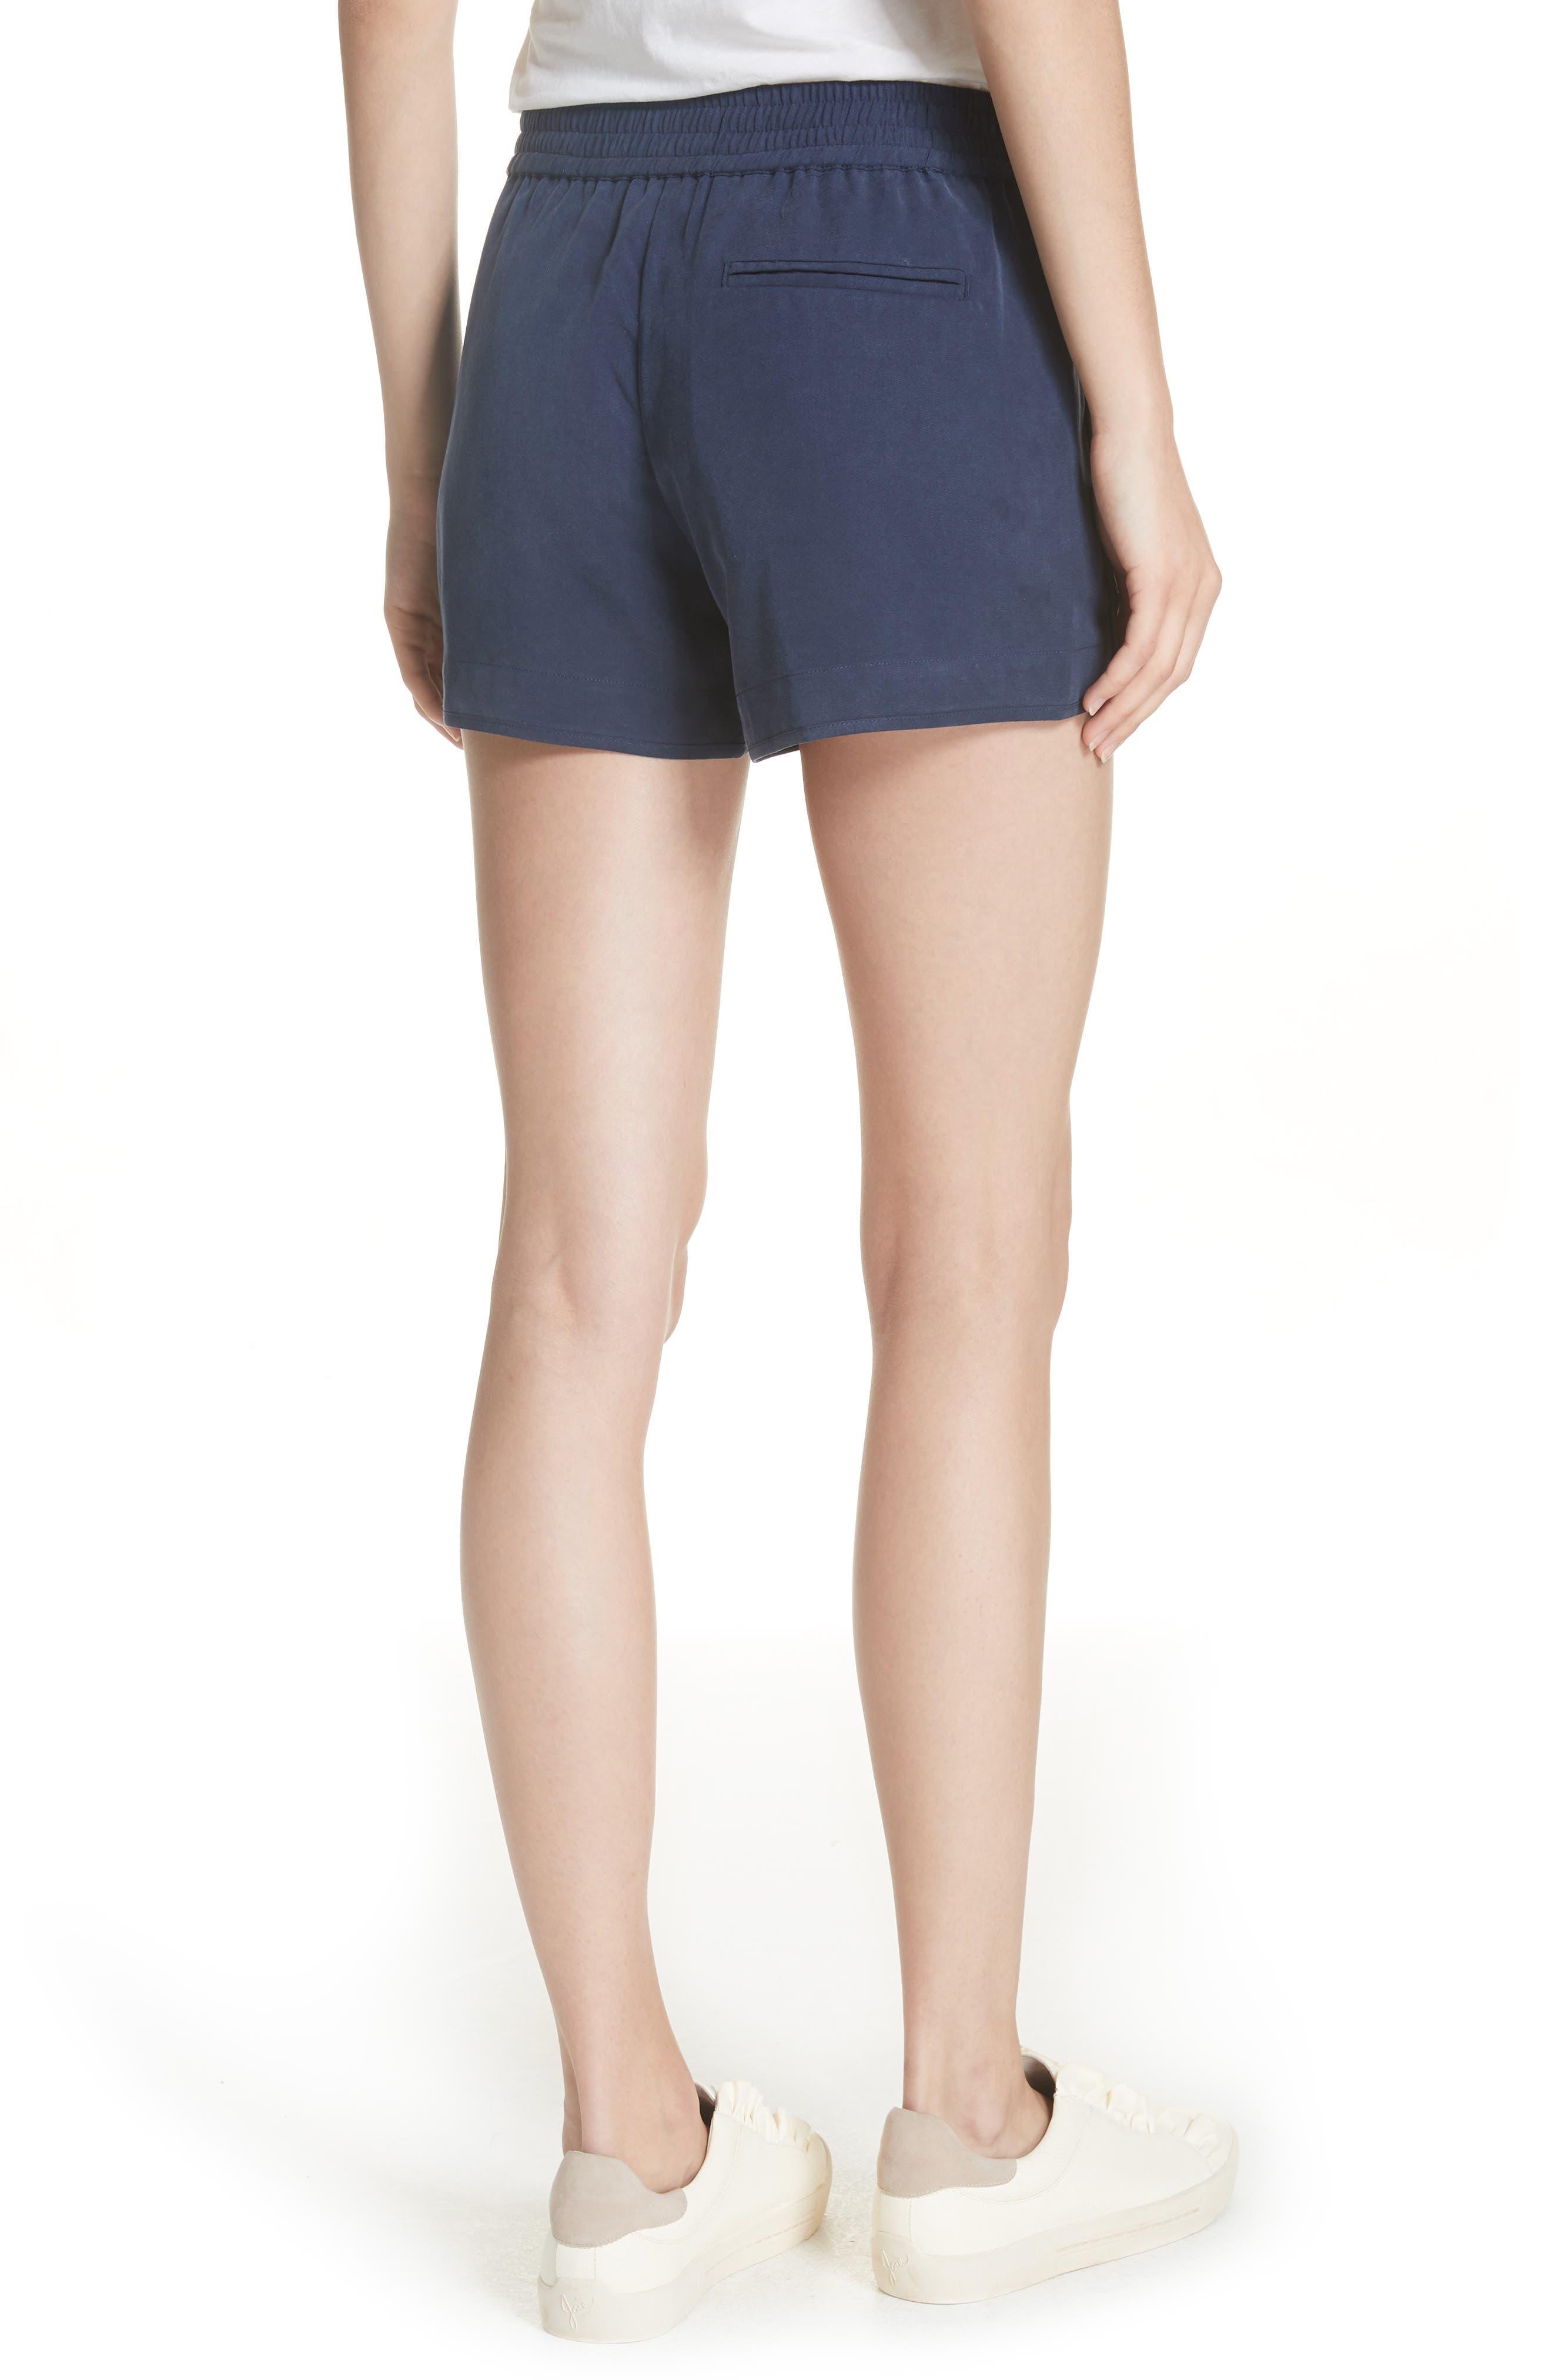 Beso Shorts,                             Alternate thumbnail 2, color,                             418